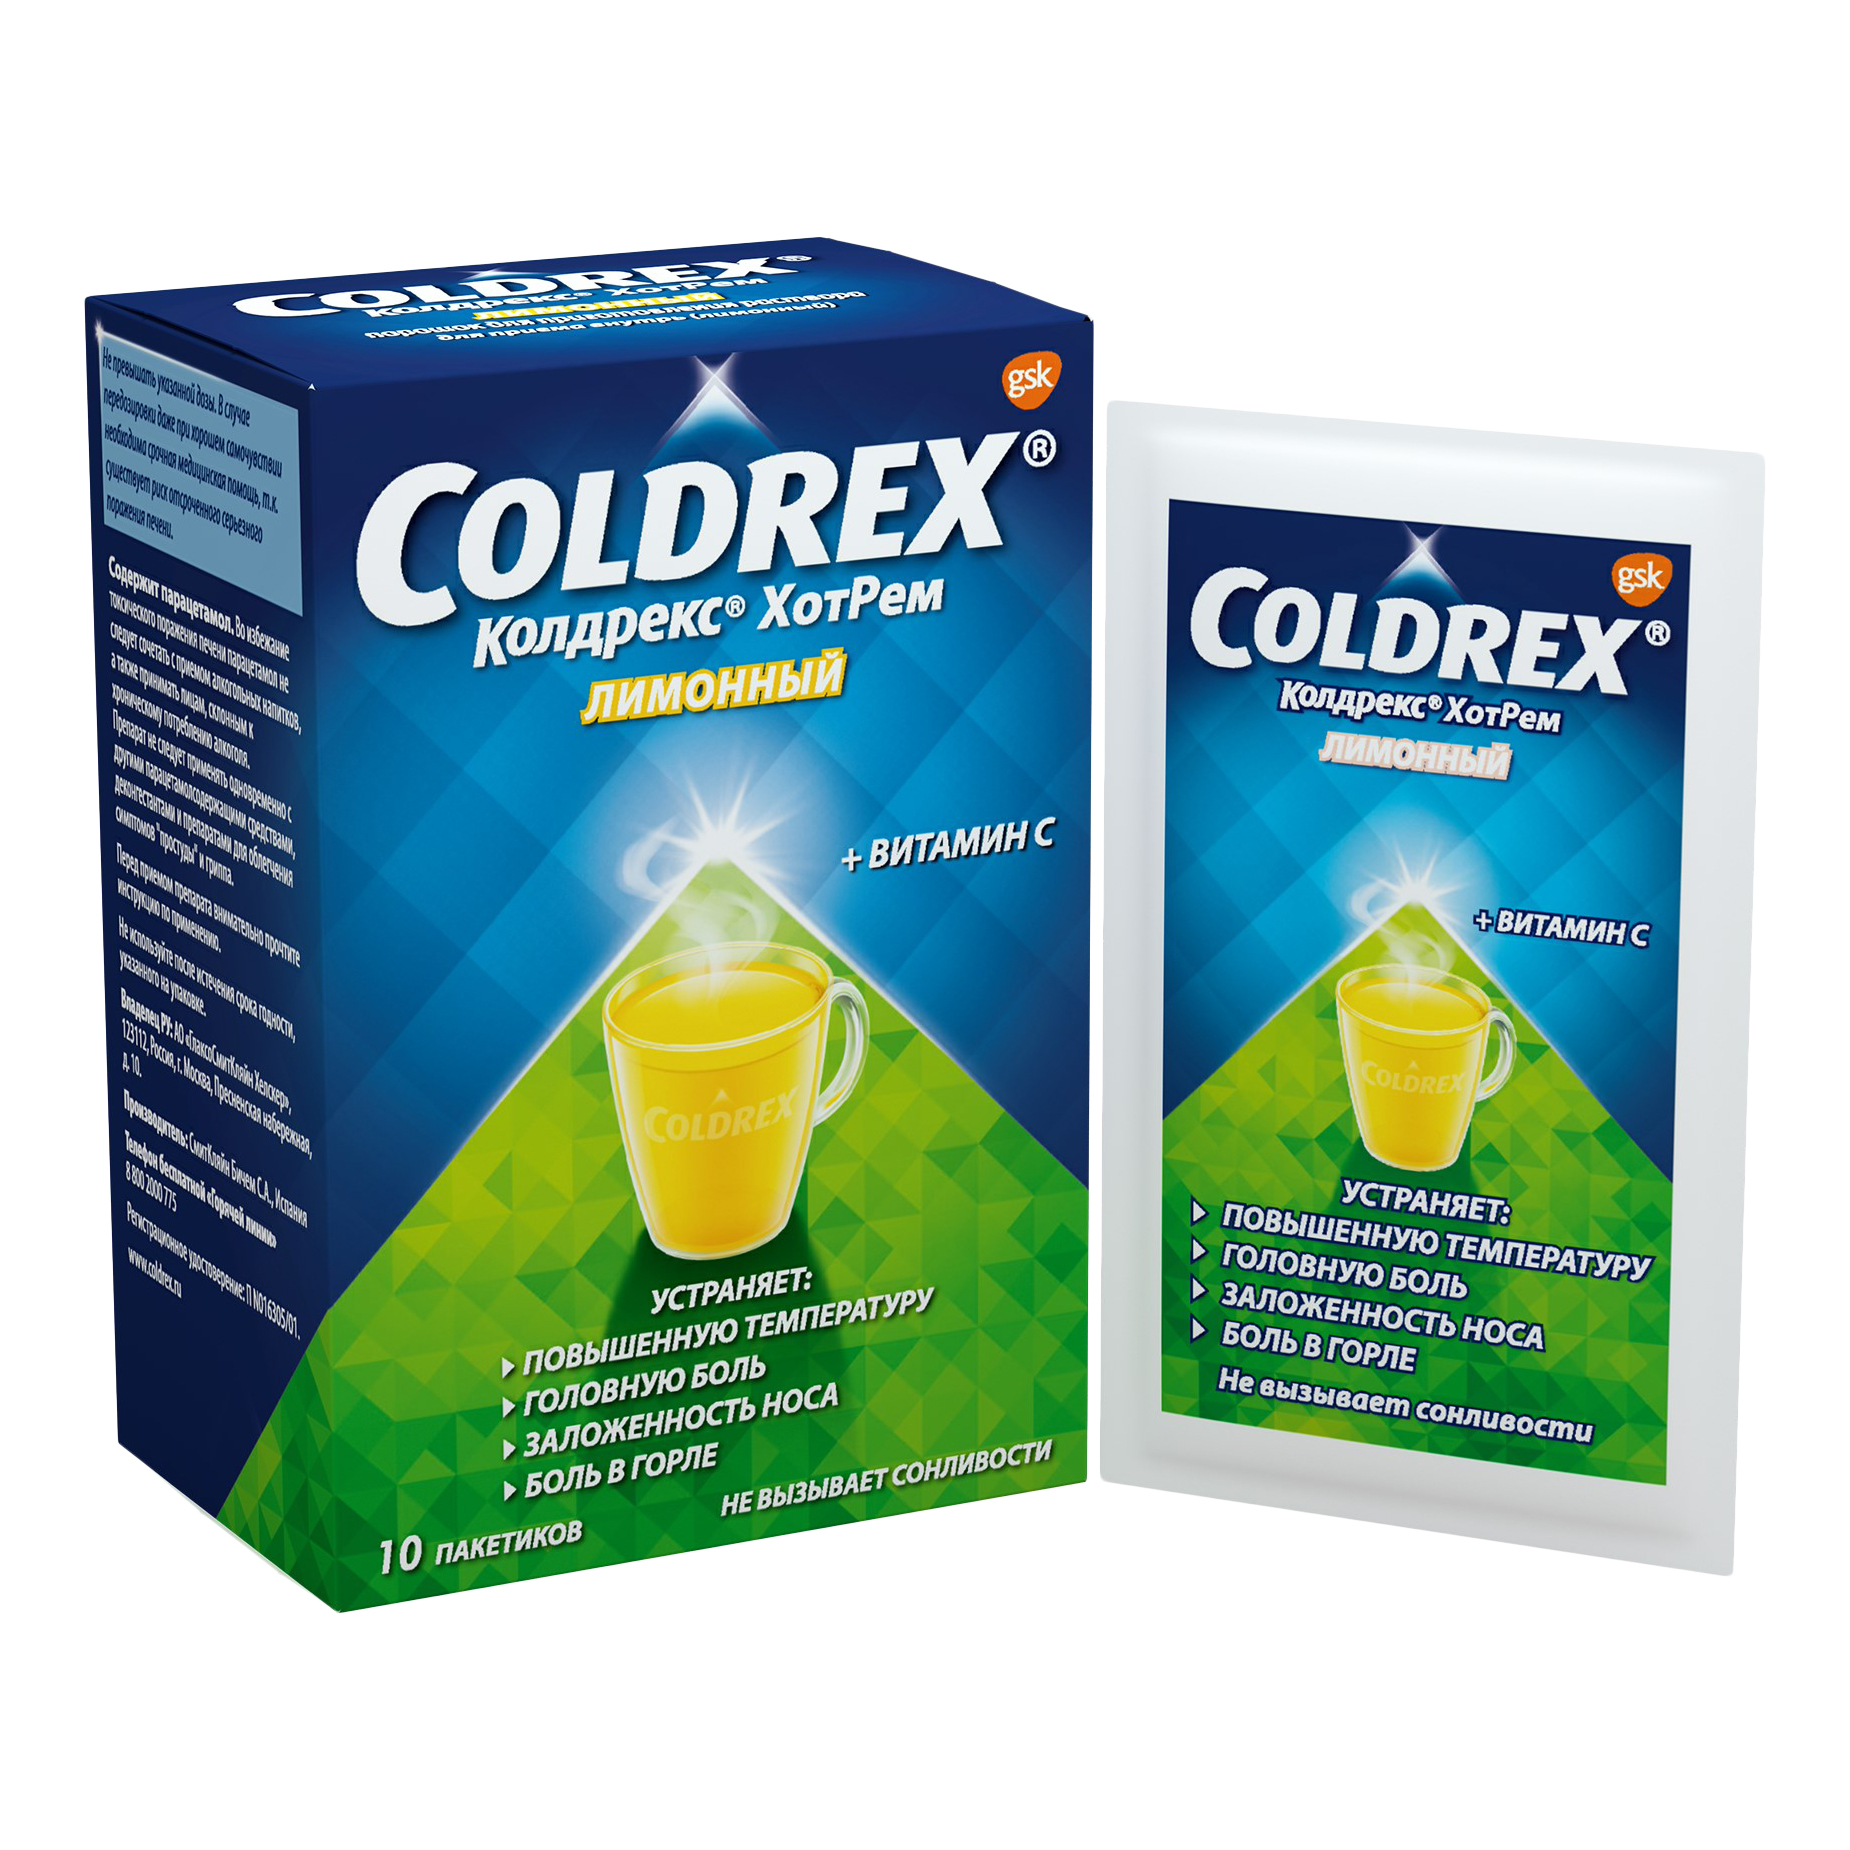 Купить Колдрекс Хотрем порошок 5 г со вкусом лимона 10 шт., GlaxoSmithKline